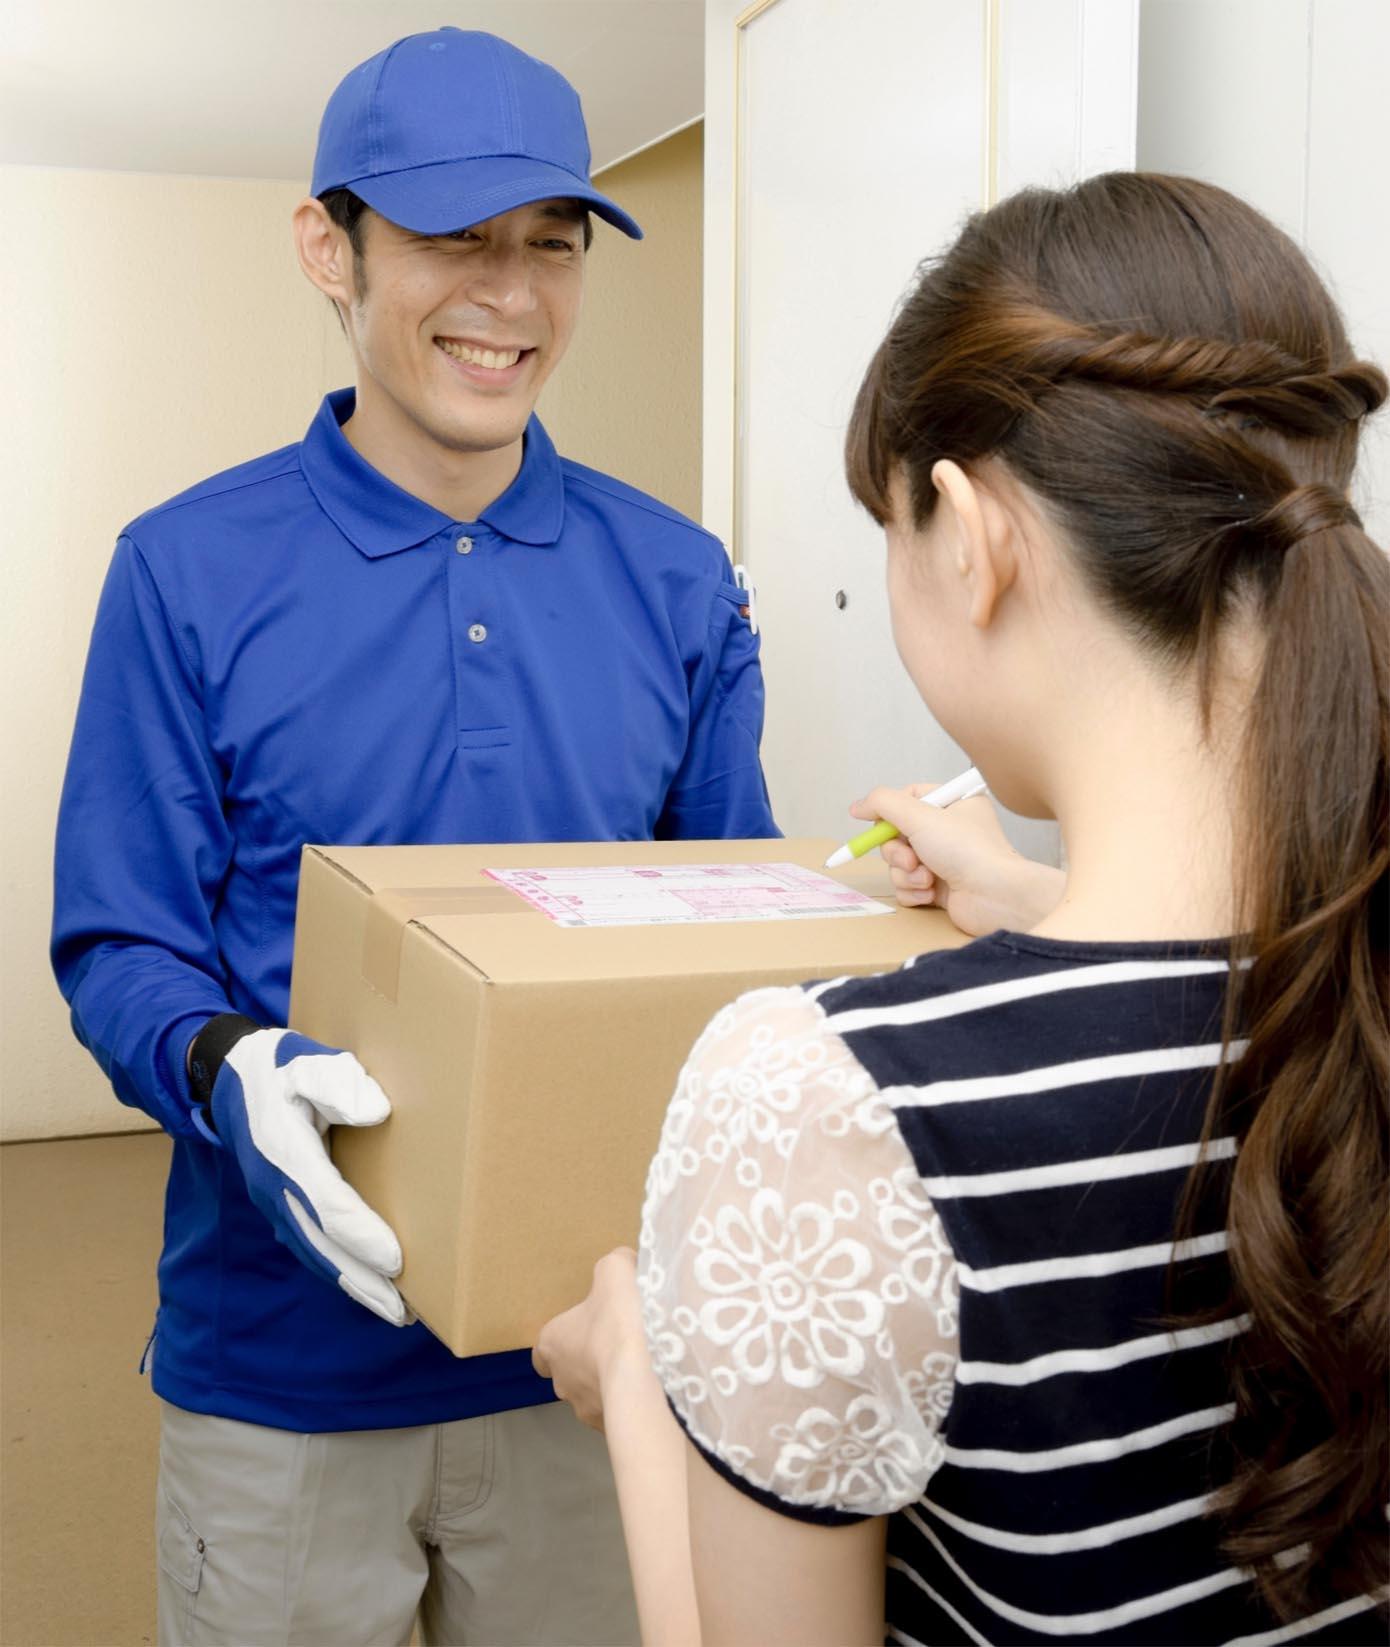 amazon-adp-delivery-provider